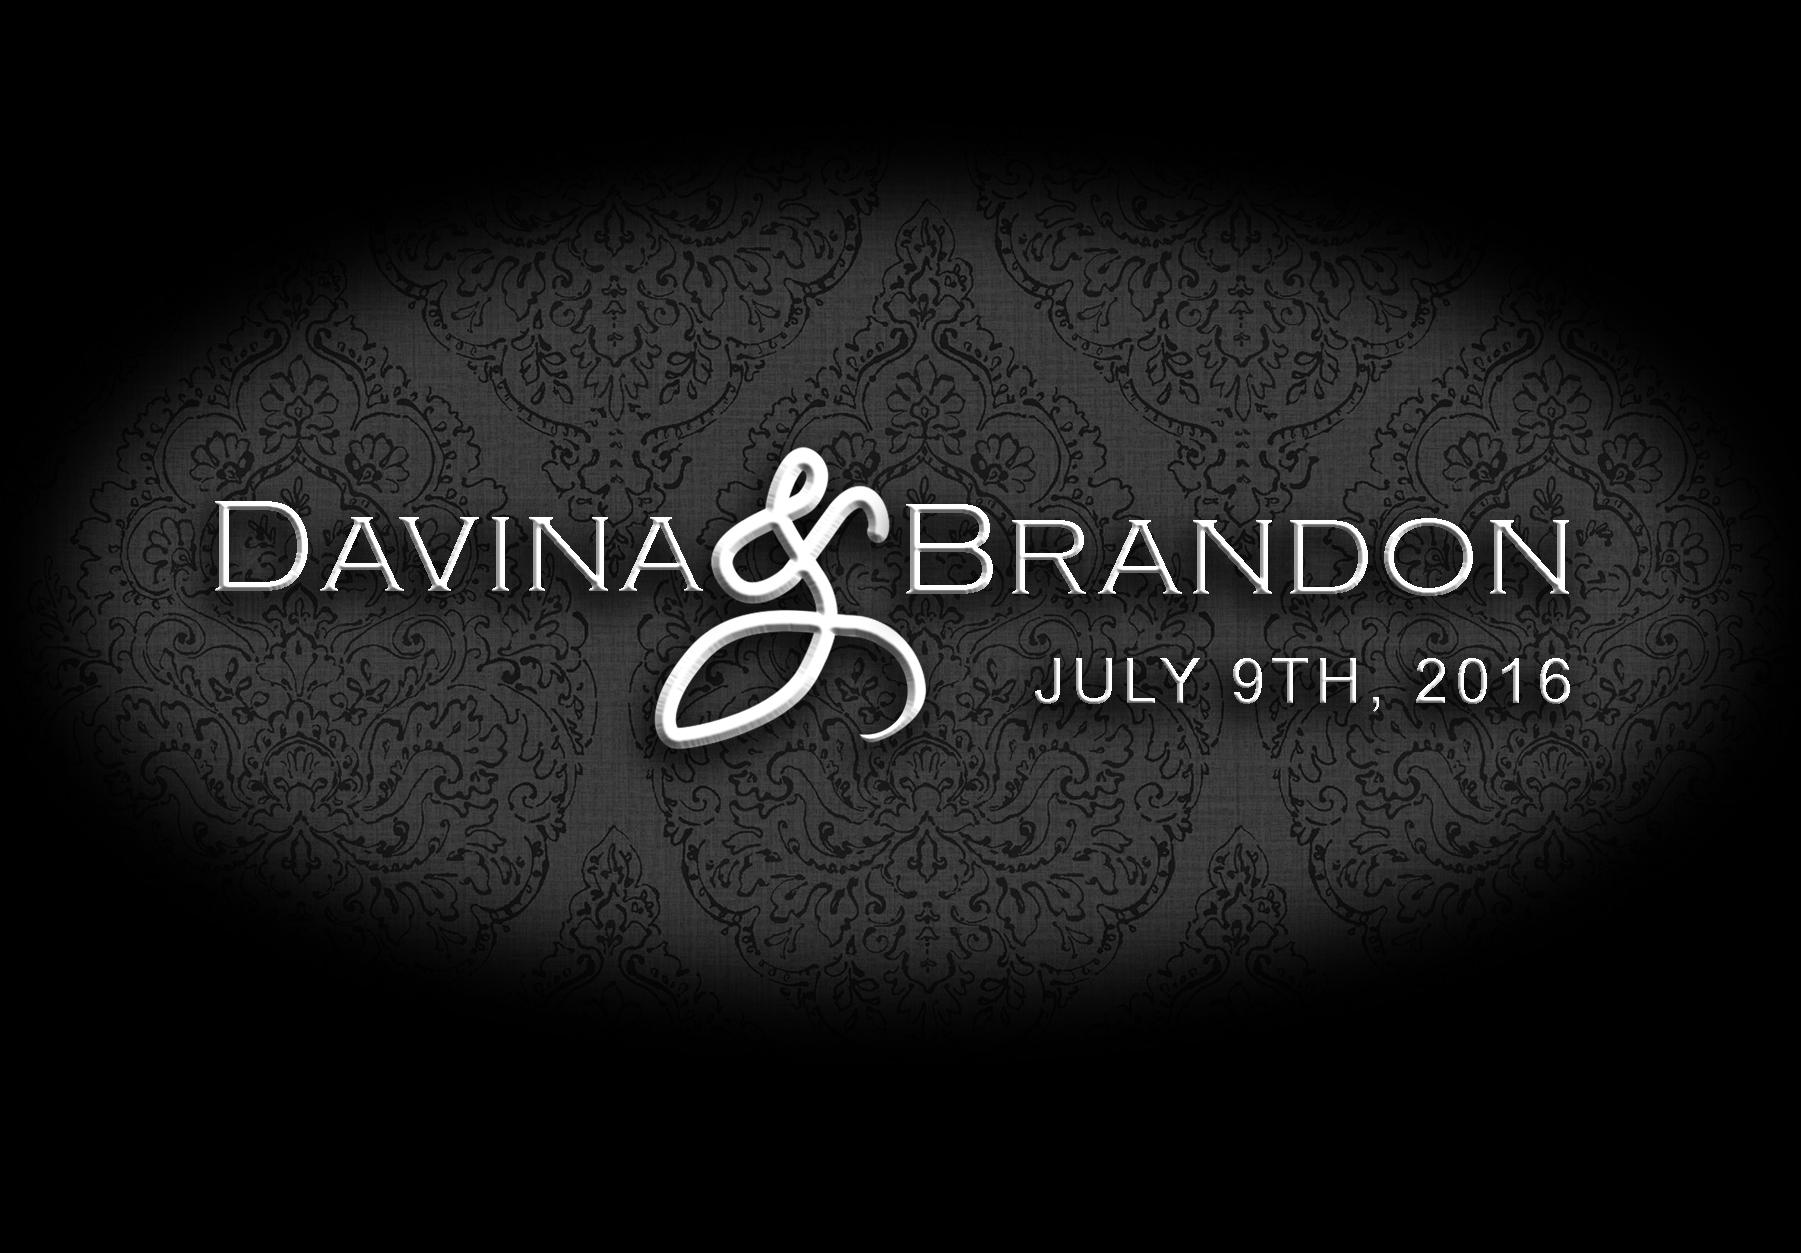 DAVINAandBRANDON3.jpg